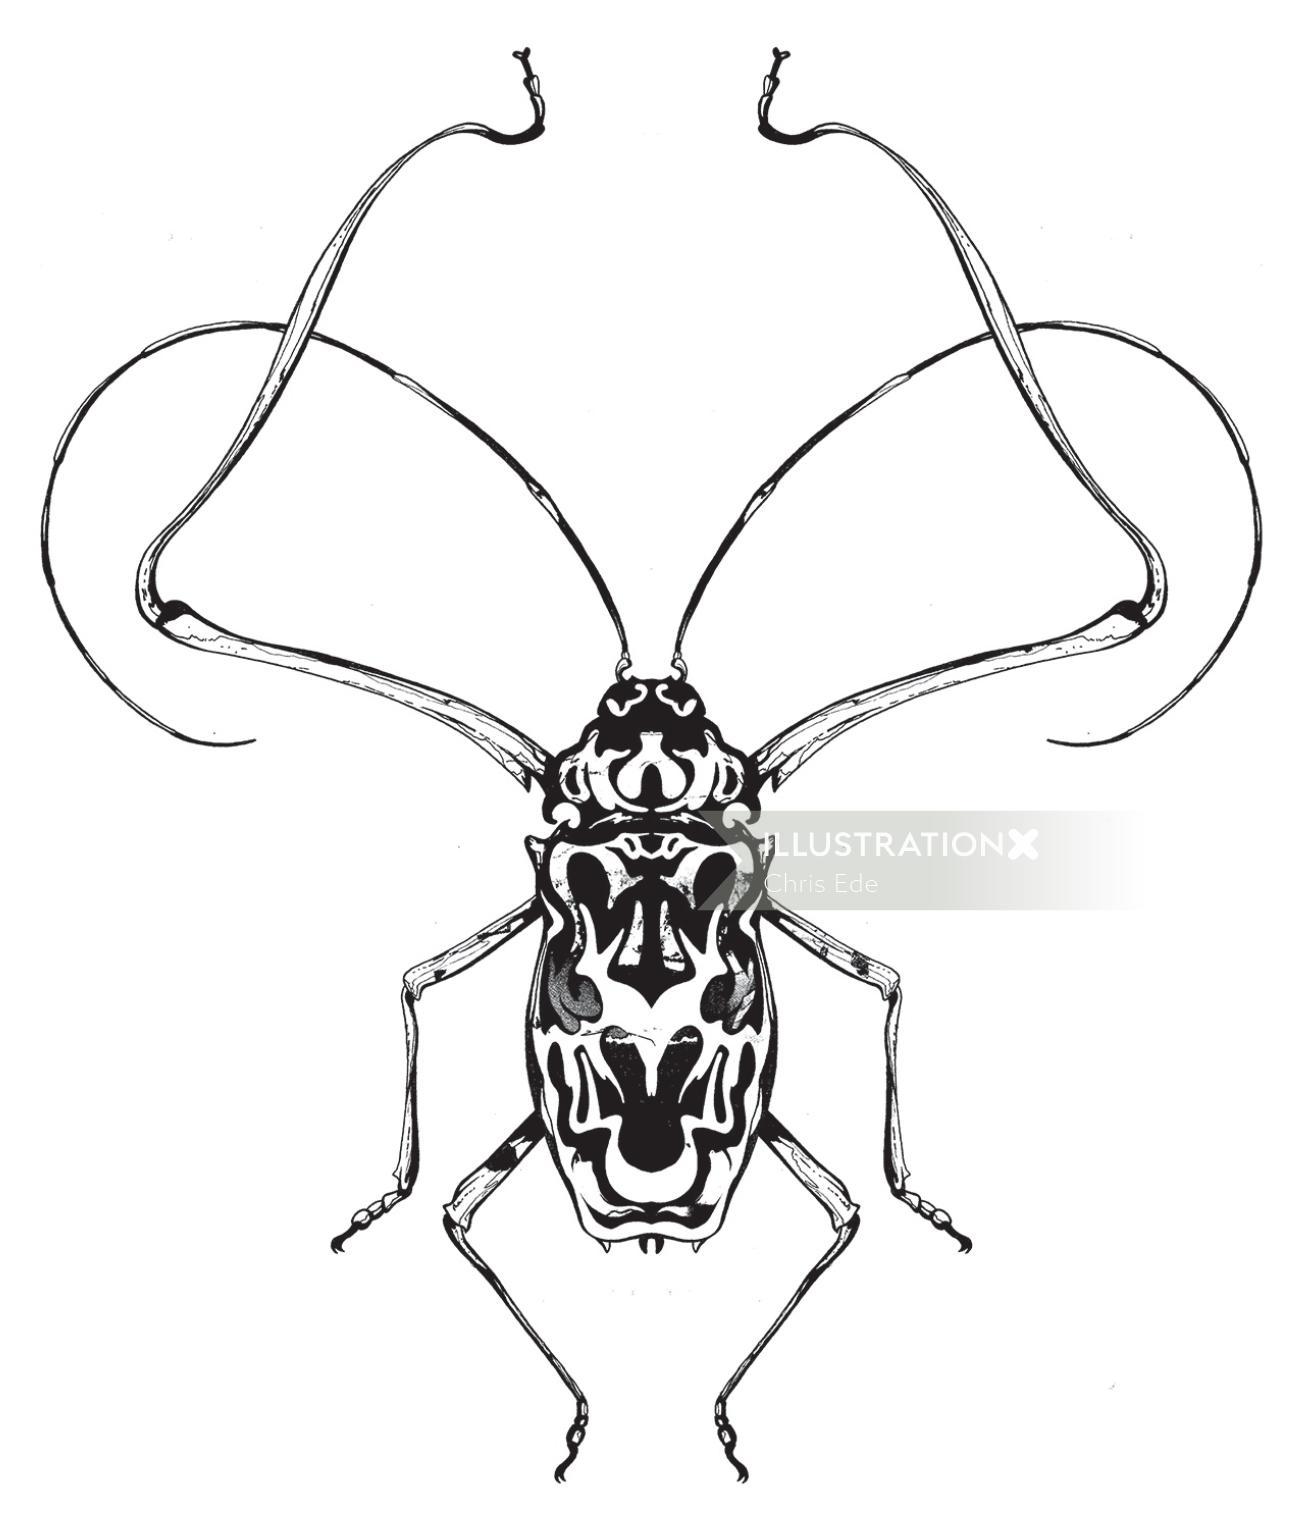 bug engraving illustration